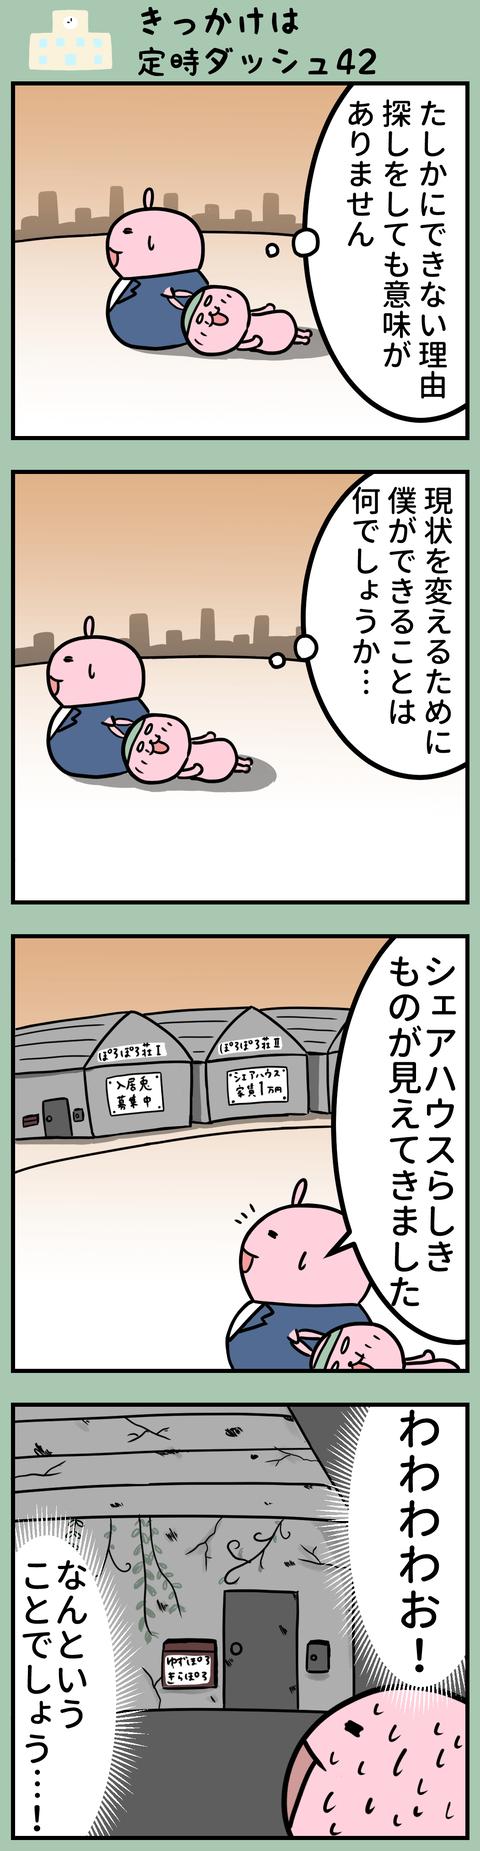 manga-yuzuporo112-1